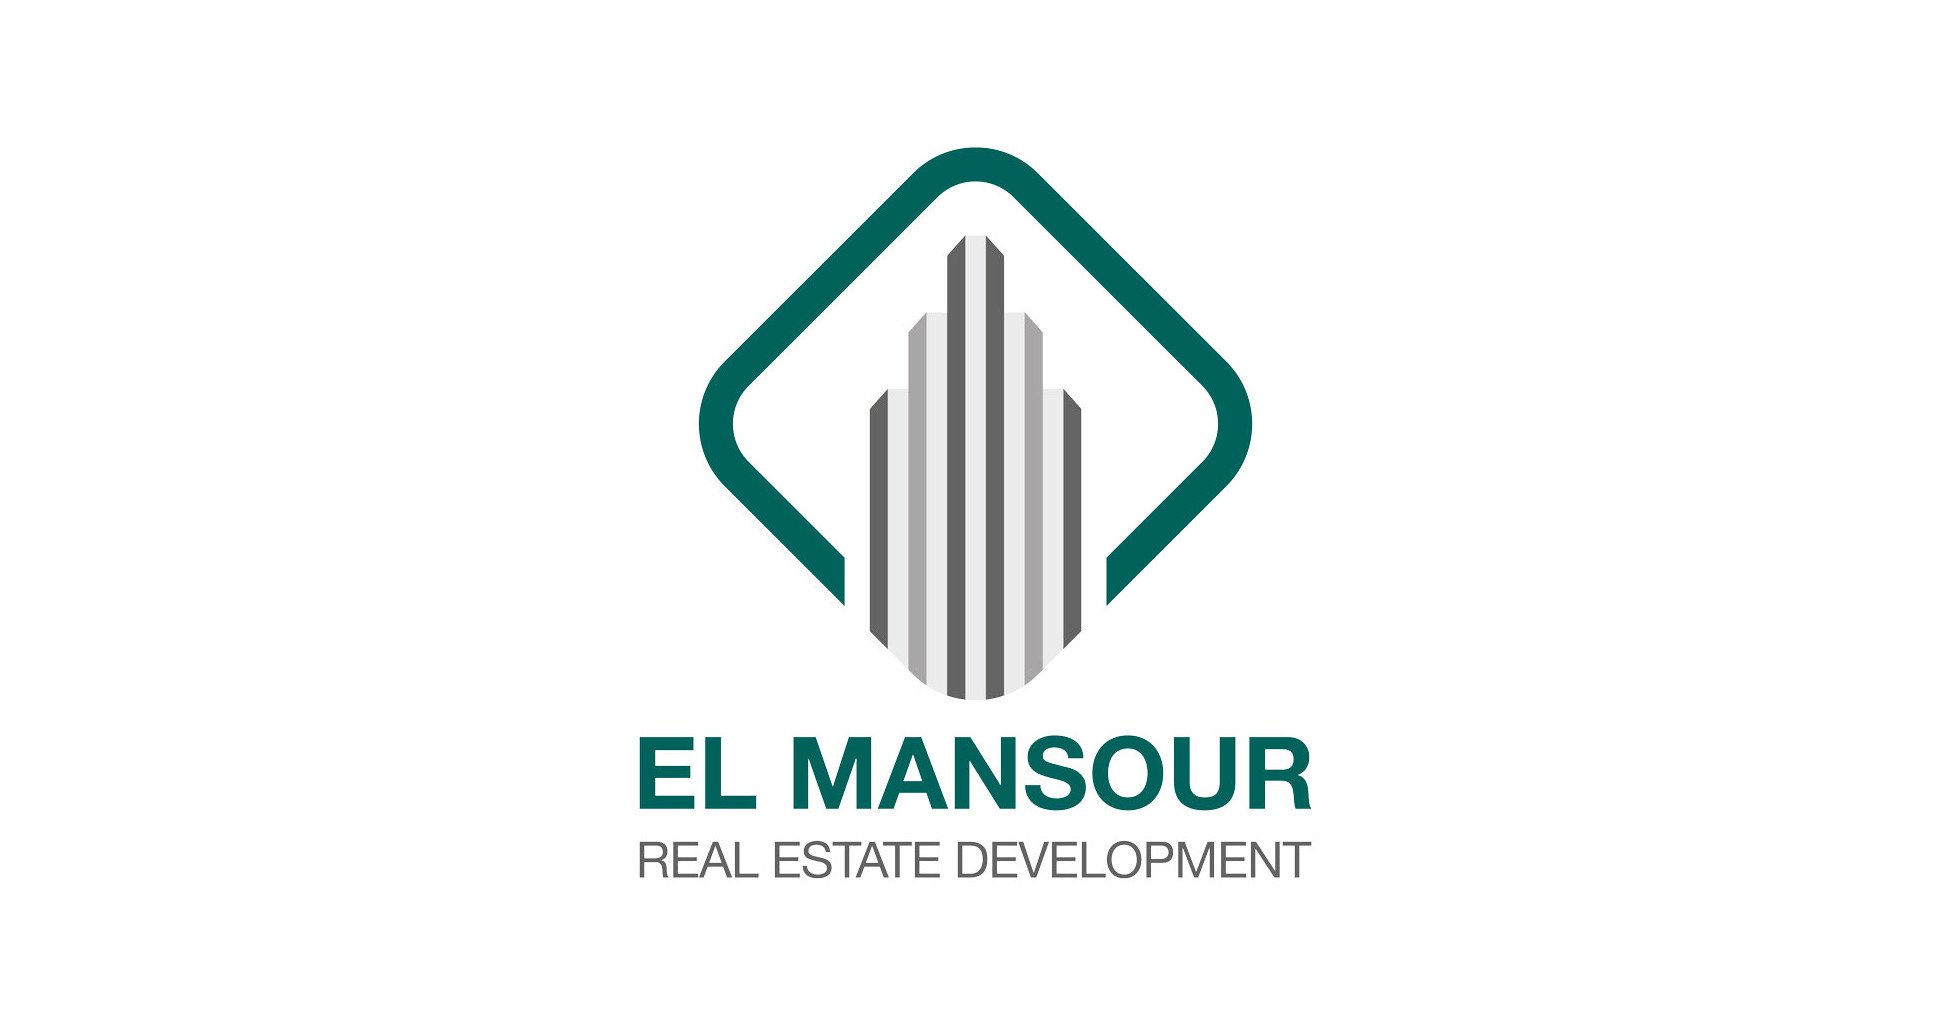 Job: Recruitment & OD Specialist at Memar El Mansour in Cairo, Egypt